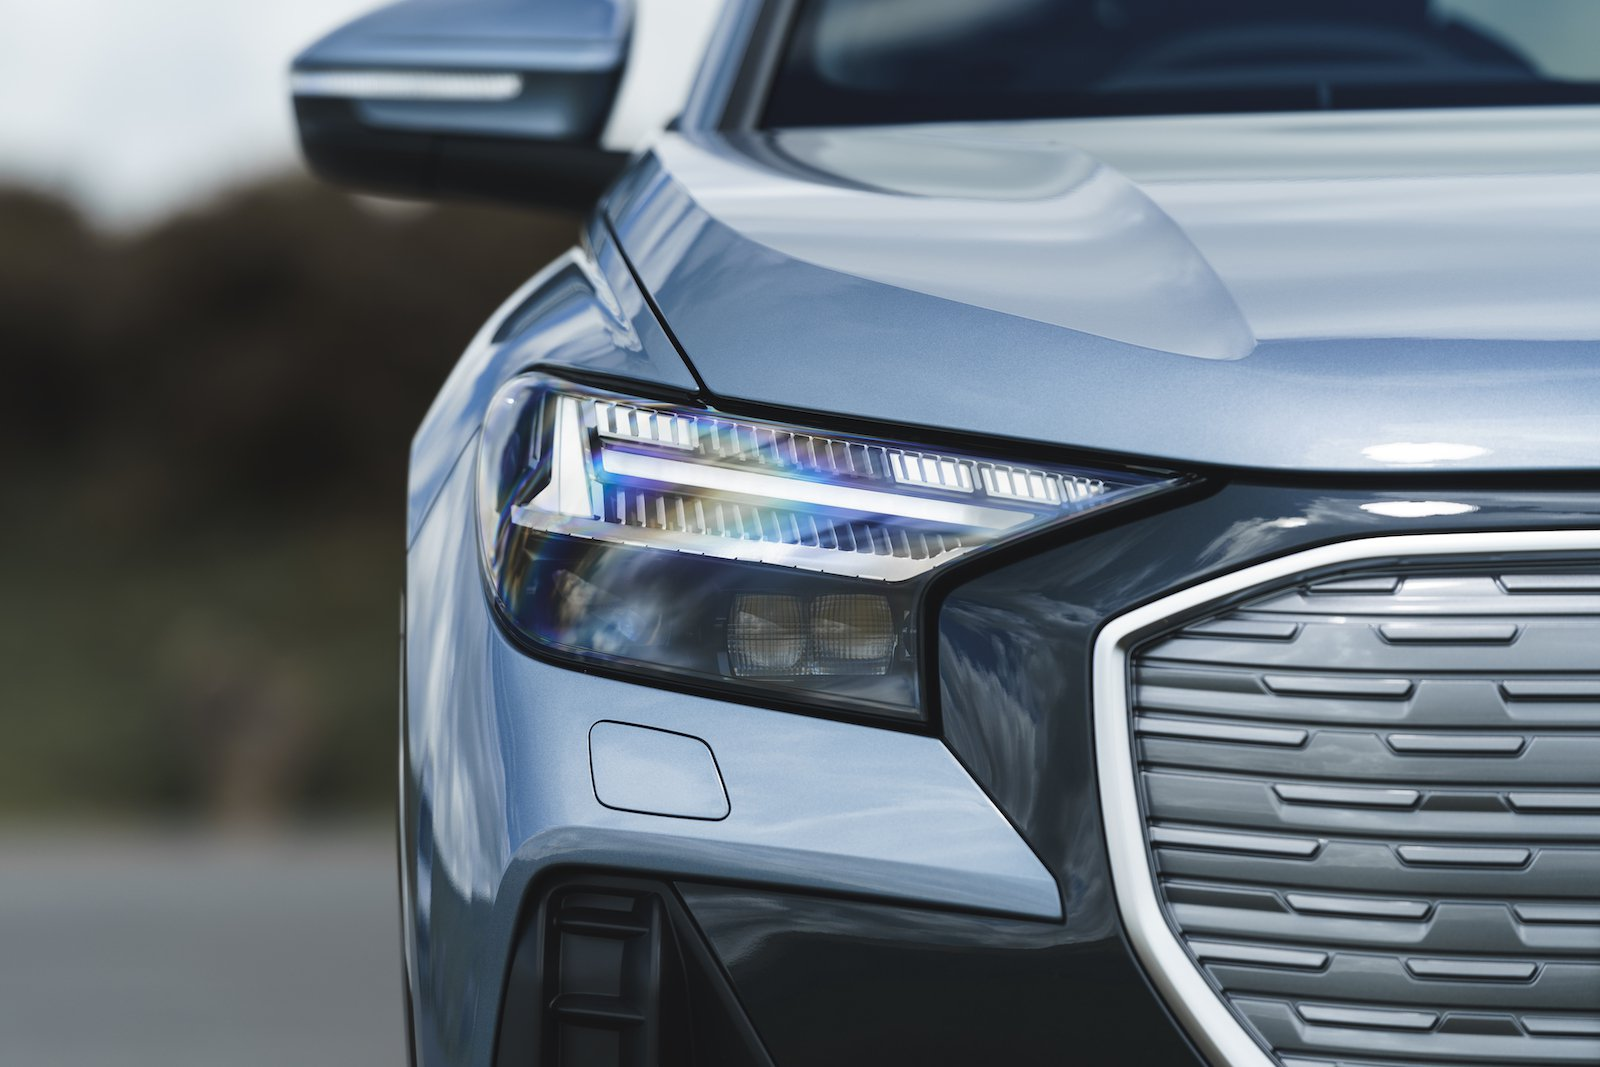 Audi Q4 e-tron 2021 headlight detail